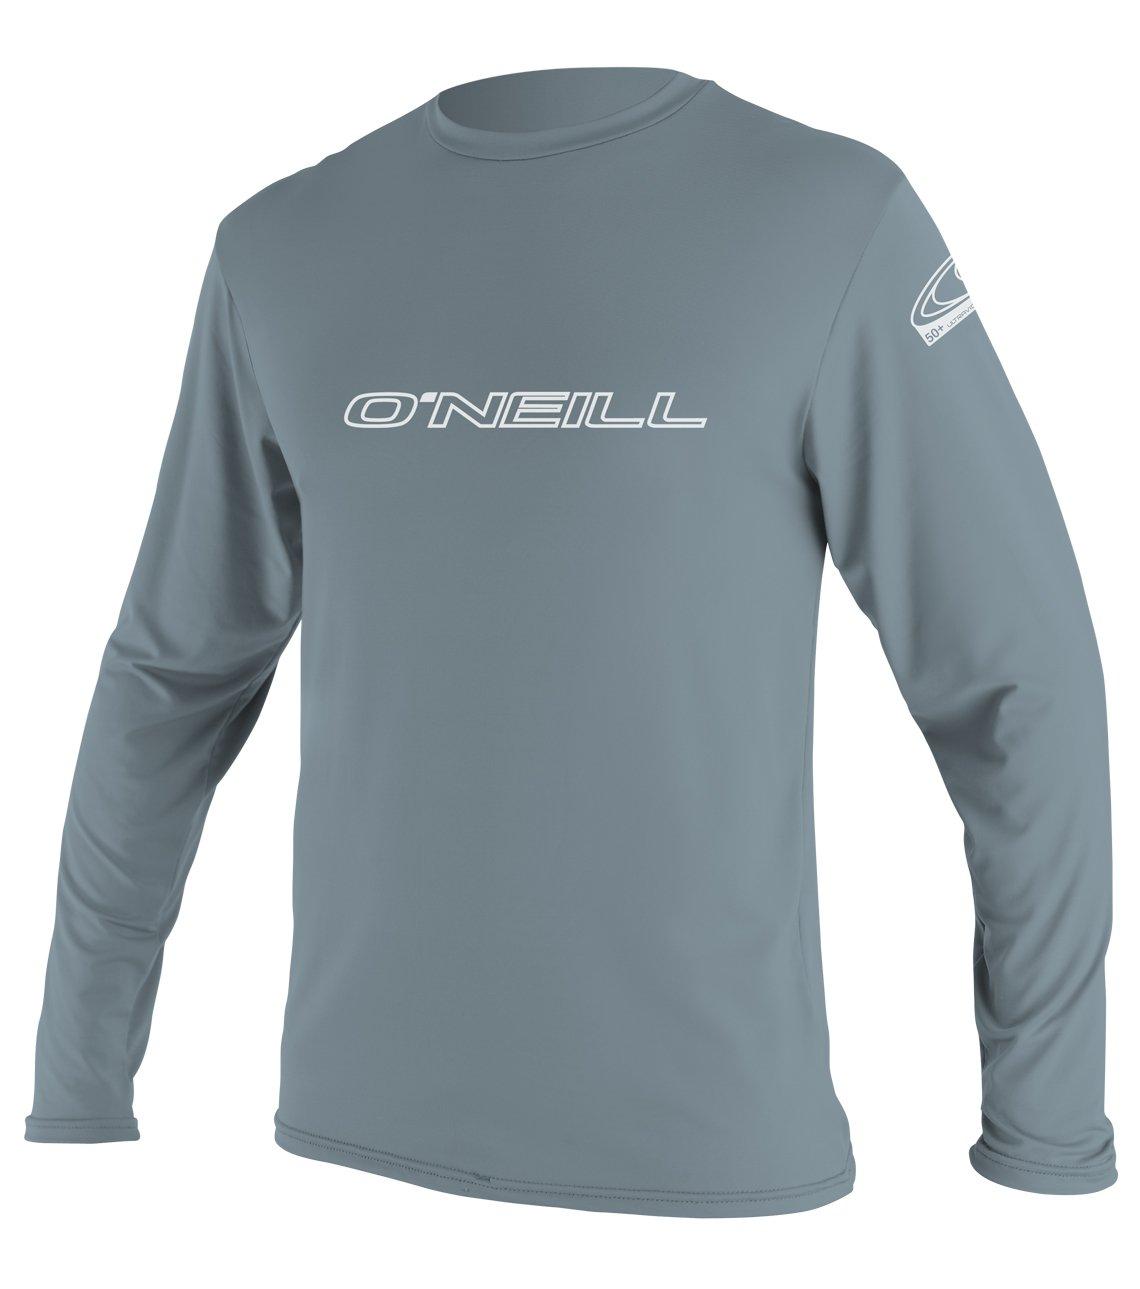 O'Neill Wetsuits Men's Basic Skins UPF 50+ Long Sleeve Sun Shirt, Dusty Blue, Medium by O'Neill Wetsuits